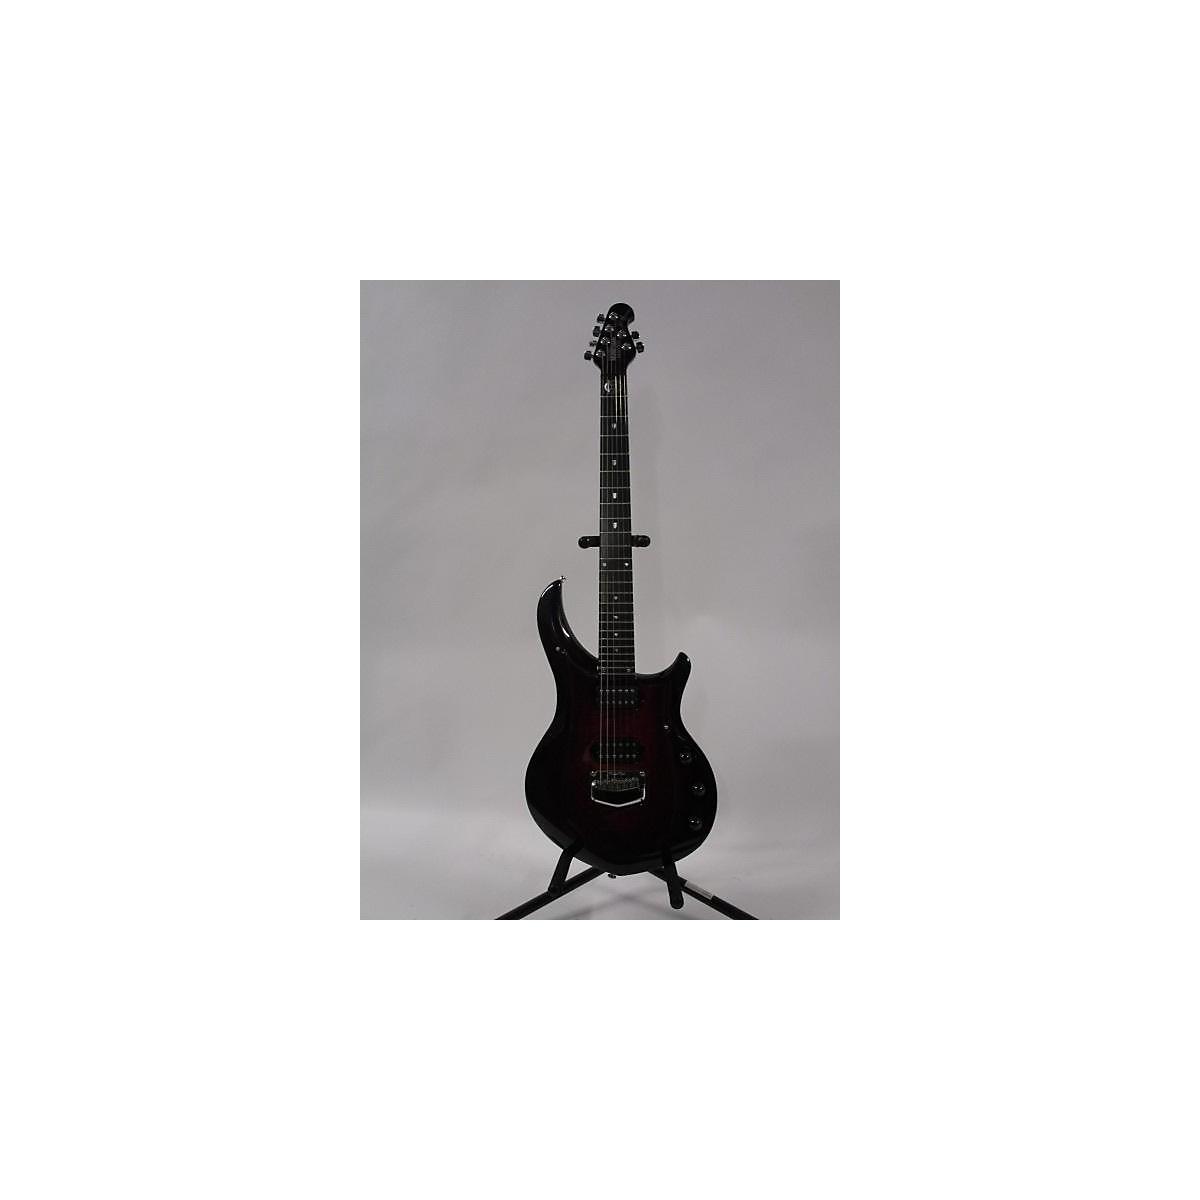 Ernie Ball Music Man Majesty 6 Monarch Solid Body Electric Guitar